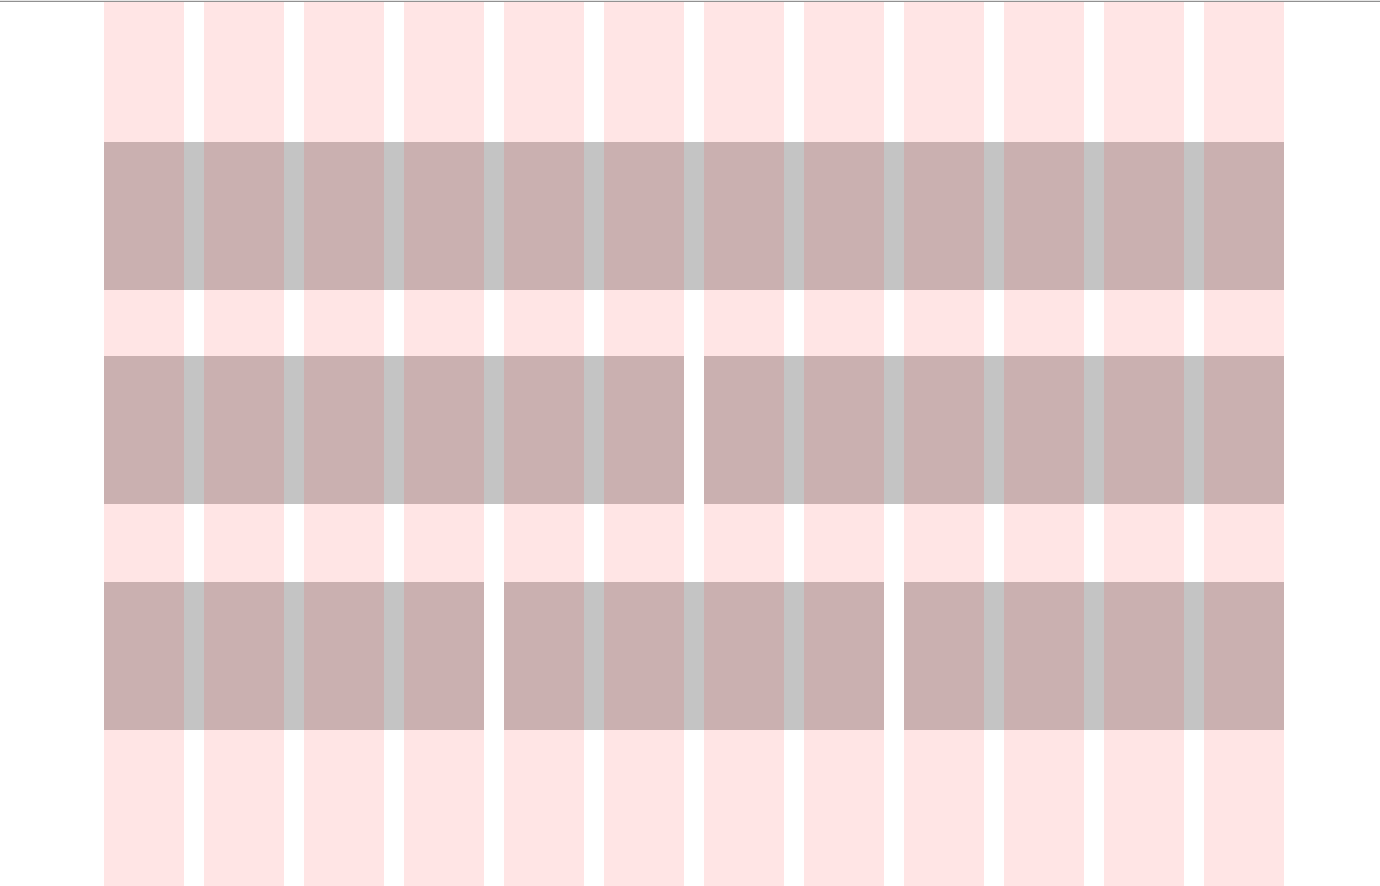 Figma Column layout